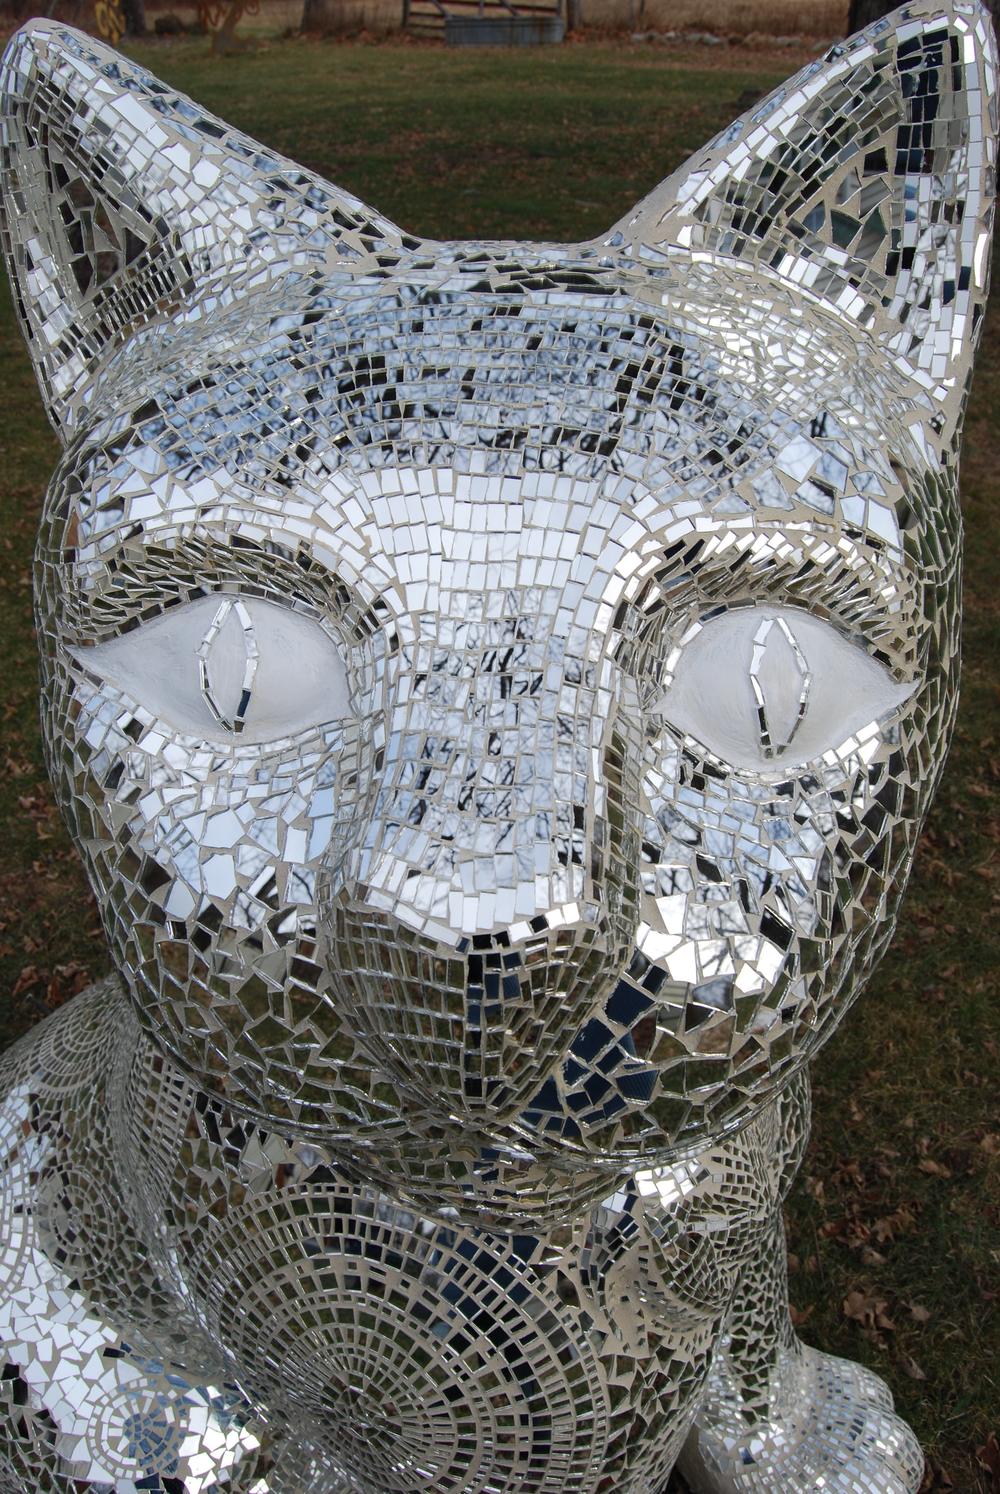 """Chloe"" Hand cut glass mirror mosaic by Shelita Birchett Benash. 5'H x 2.5W x 4'L. 2011."